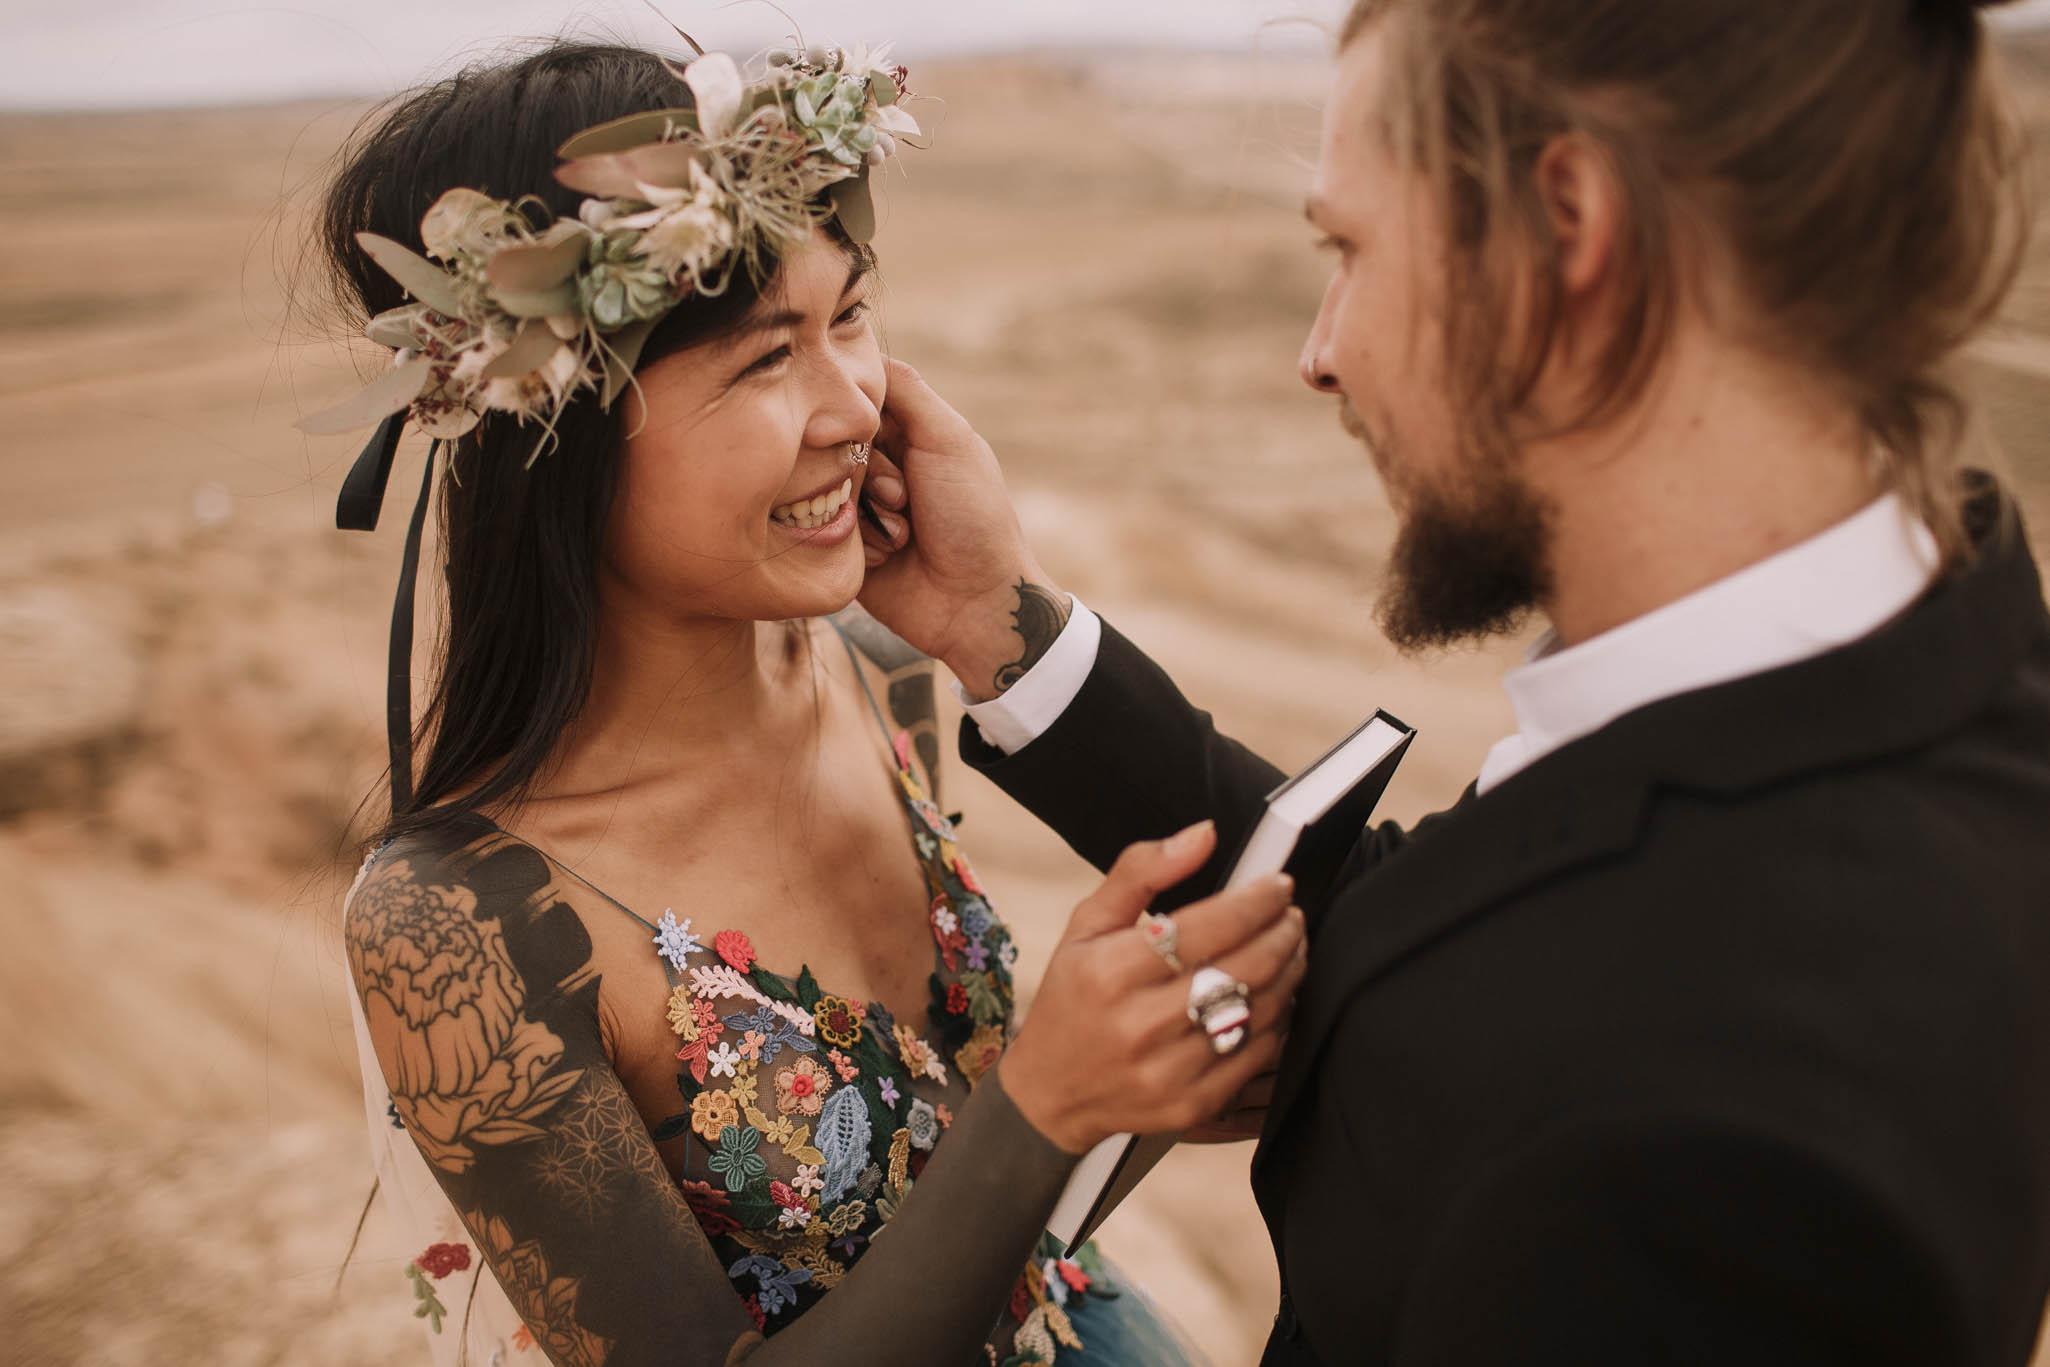 Spain-wedding-photographer-bardenas-reales-jeremy-boyer-photographe-mariage-bordeaux-floral-wedding-dress-robe-99.jpg